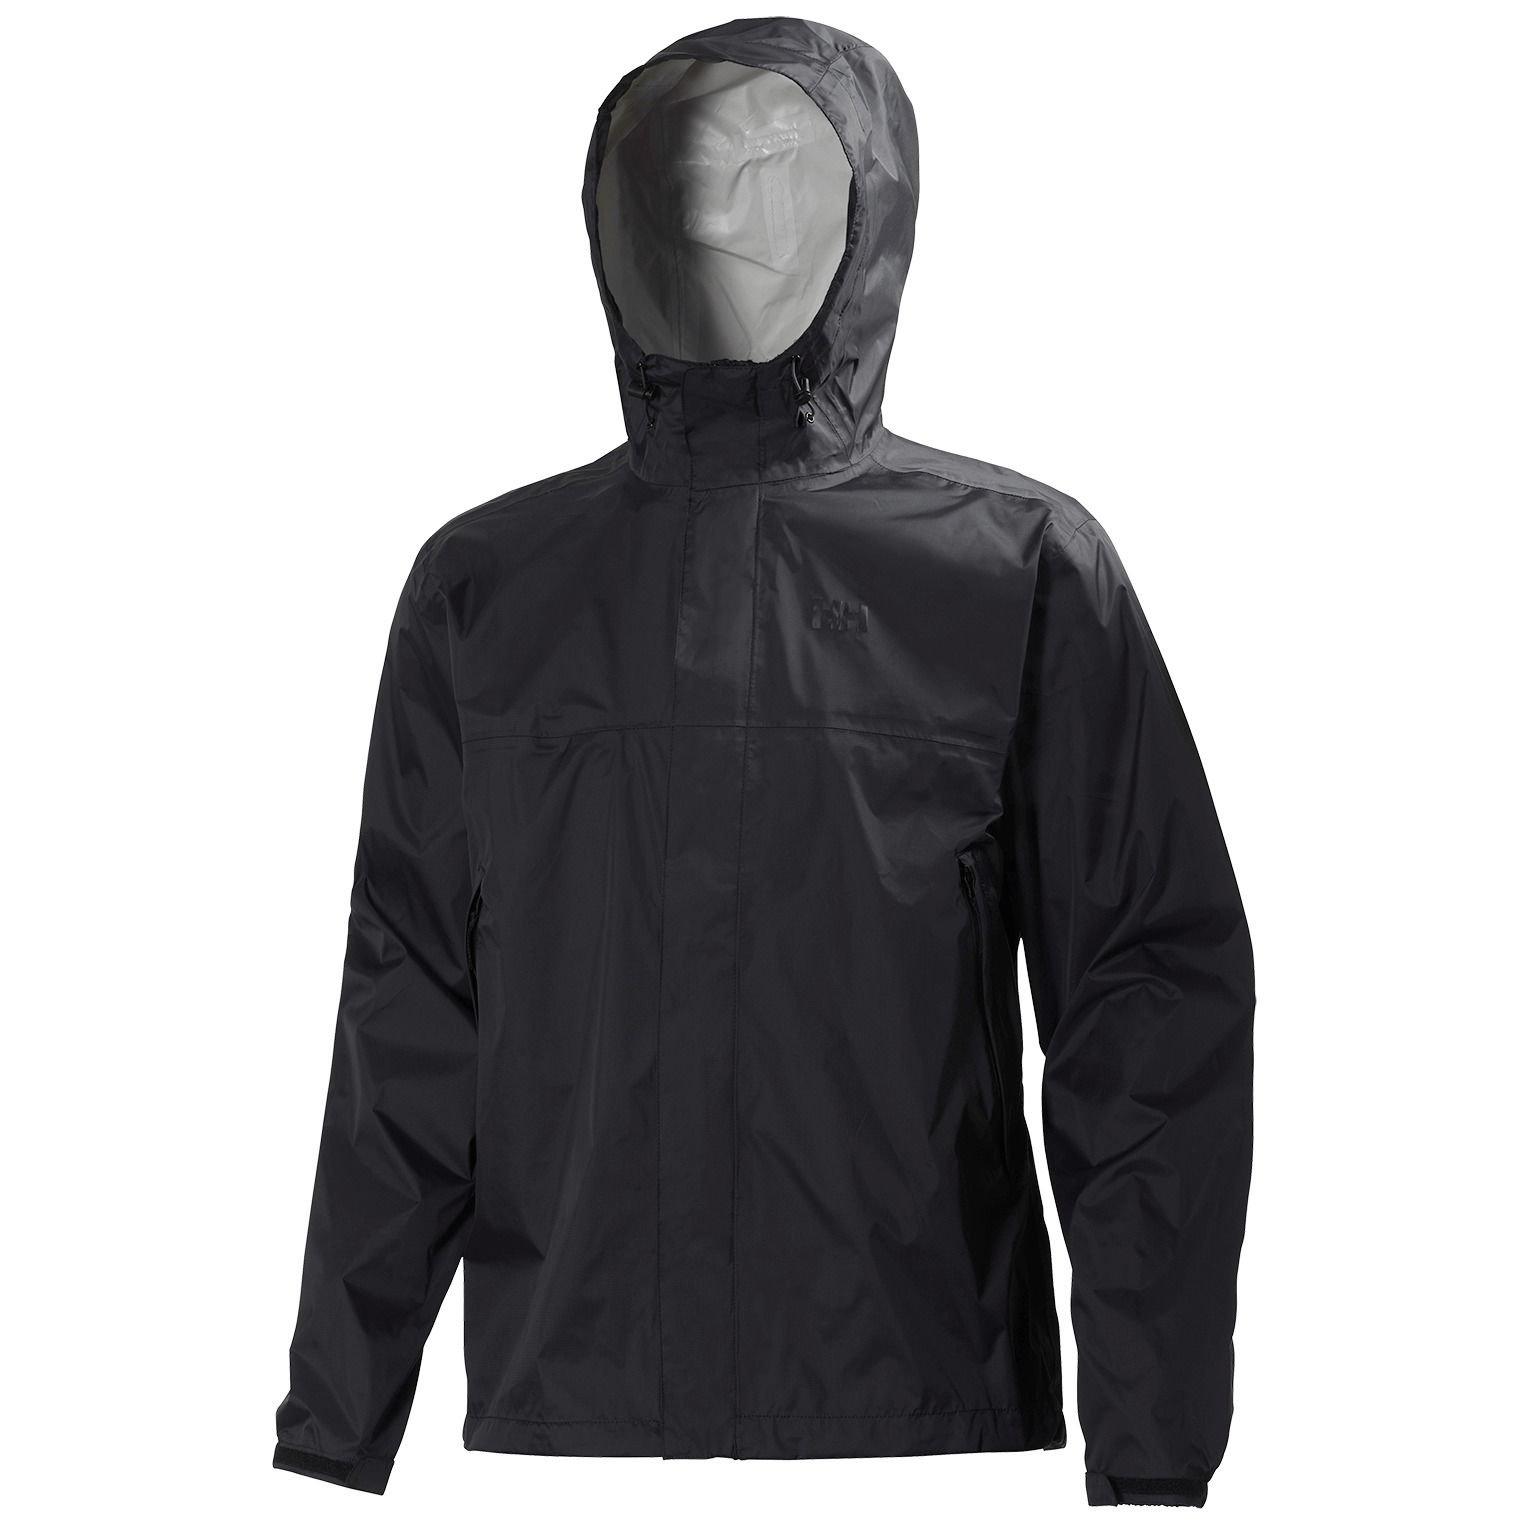 Helly Hansen Men's Loke Waterproof Windproof Breathable Adventure Rain Jacket, 990 Black, Medium